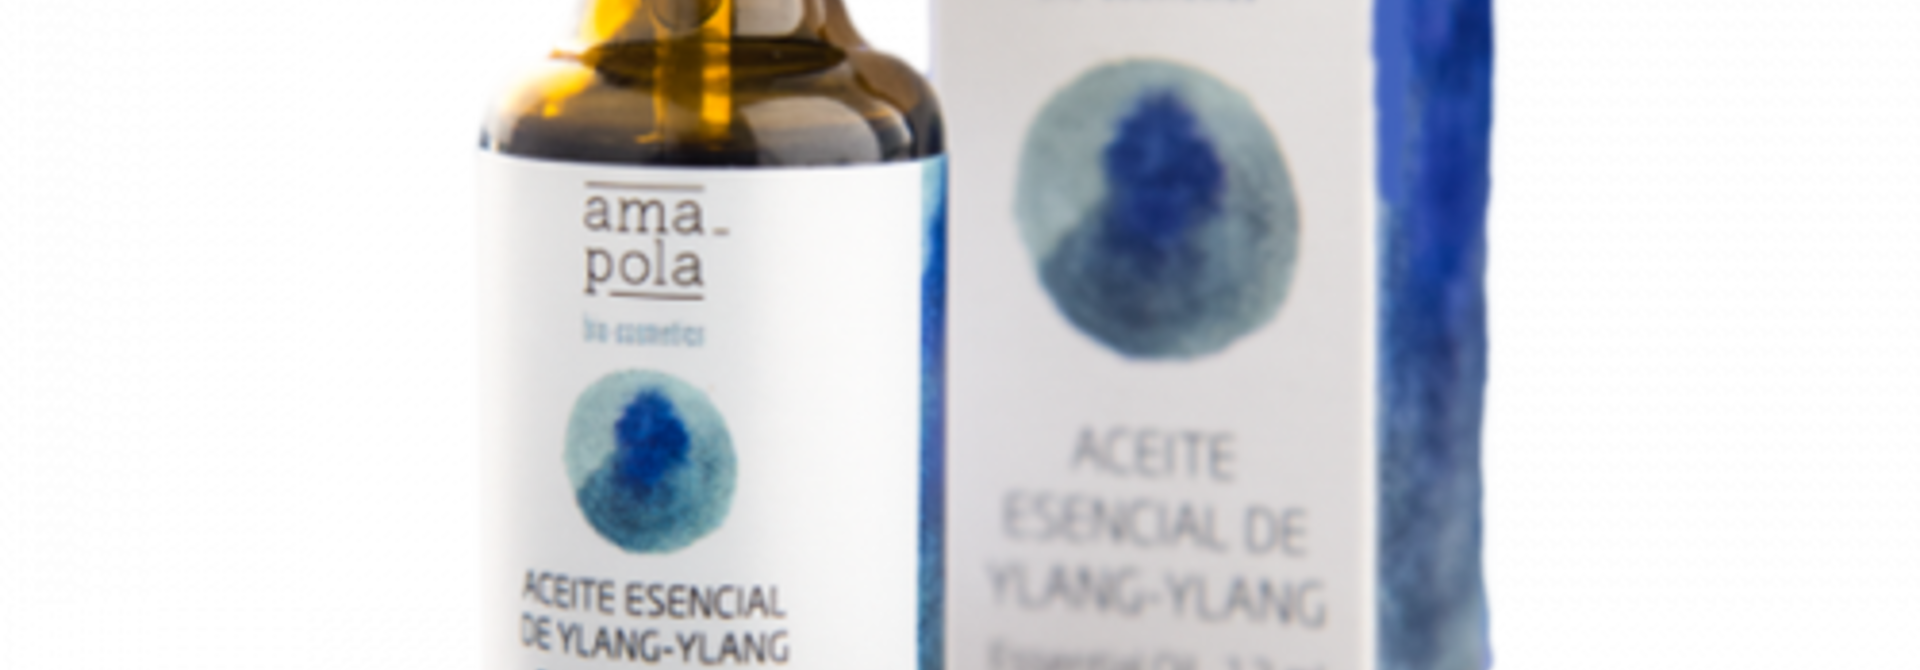 Etherische olie ylang-ylang Amapola 12ml